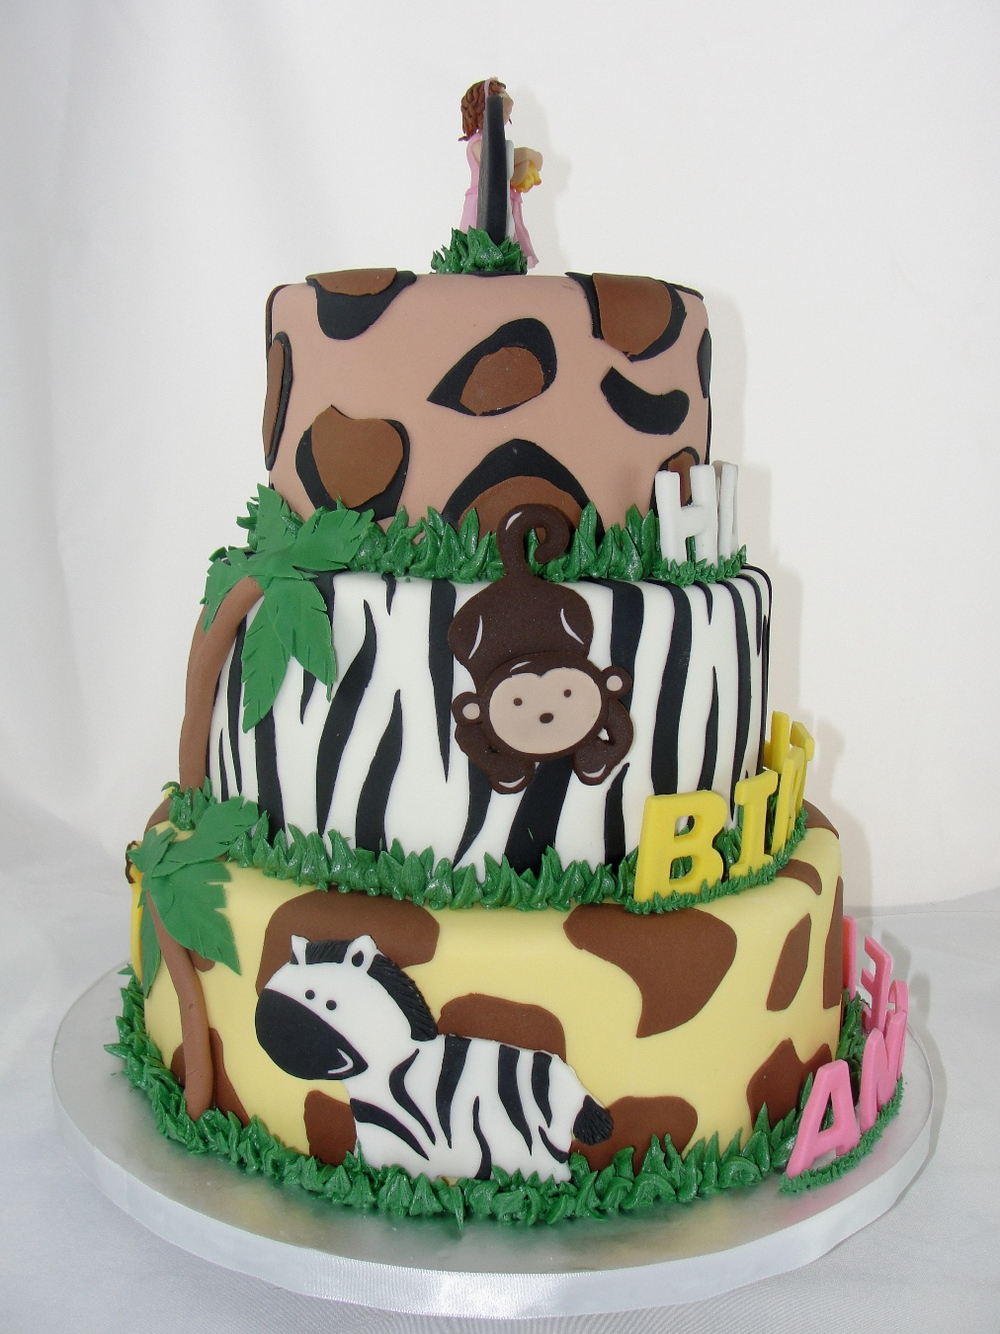 LBC 1403 - Jungle Cake 5.jpg